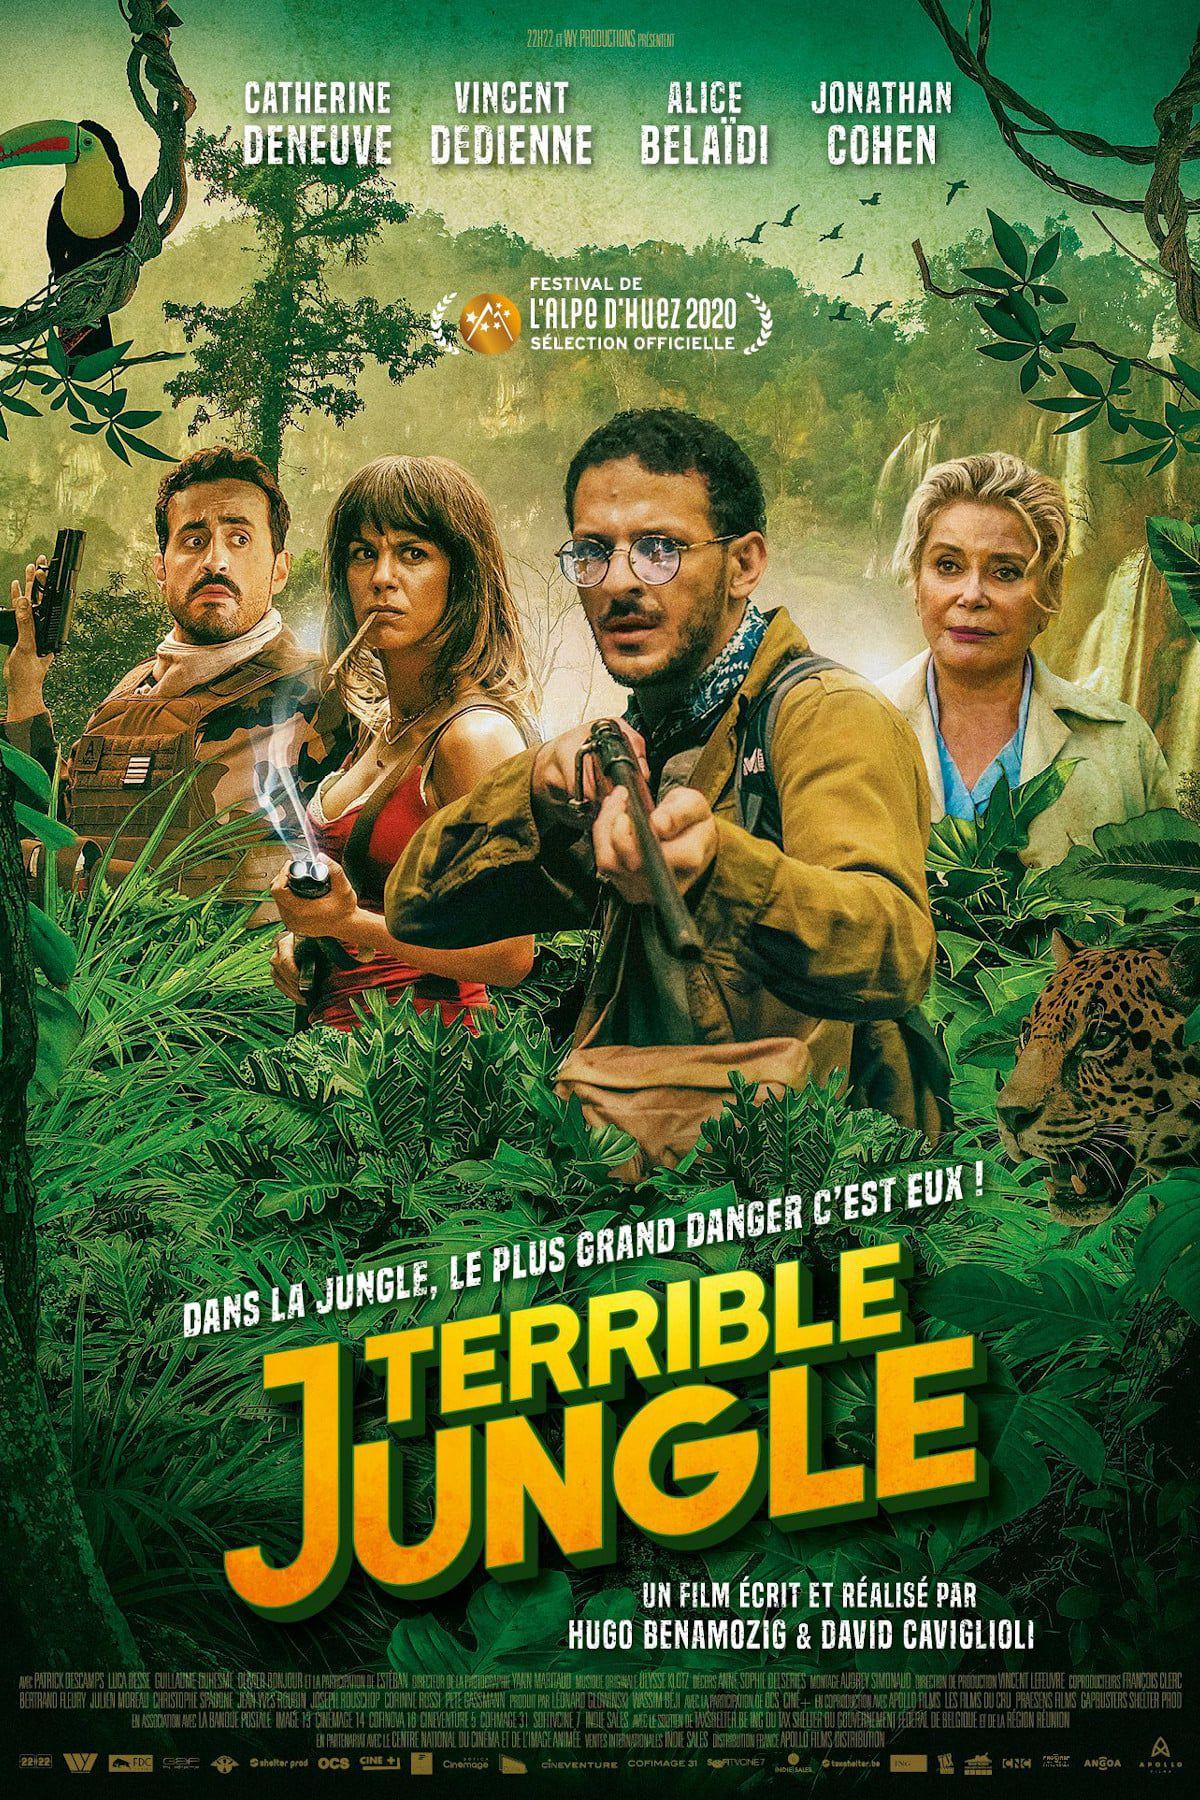 Terrible Jungle - Film (2020)